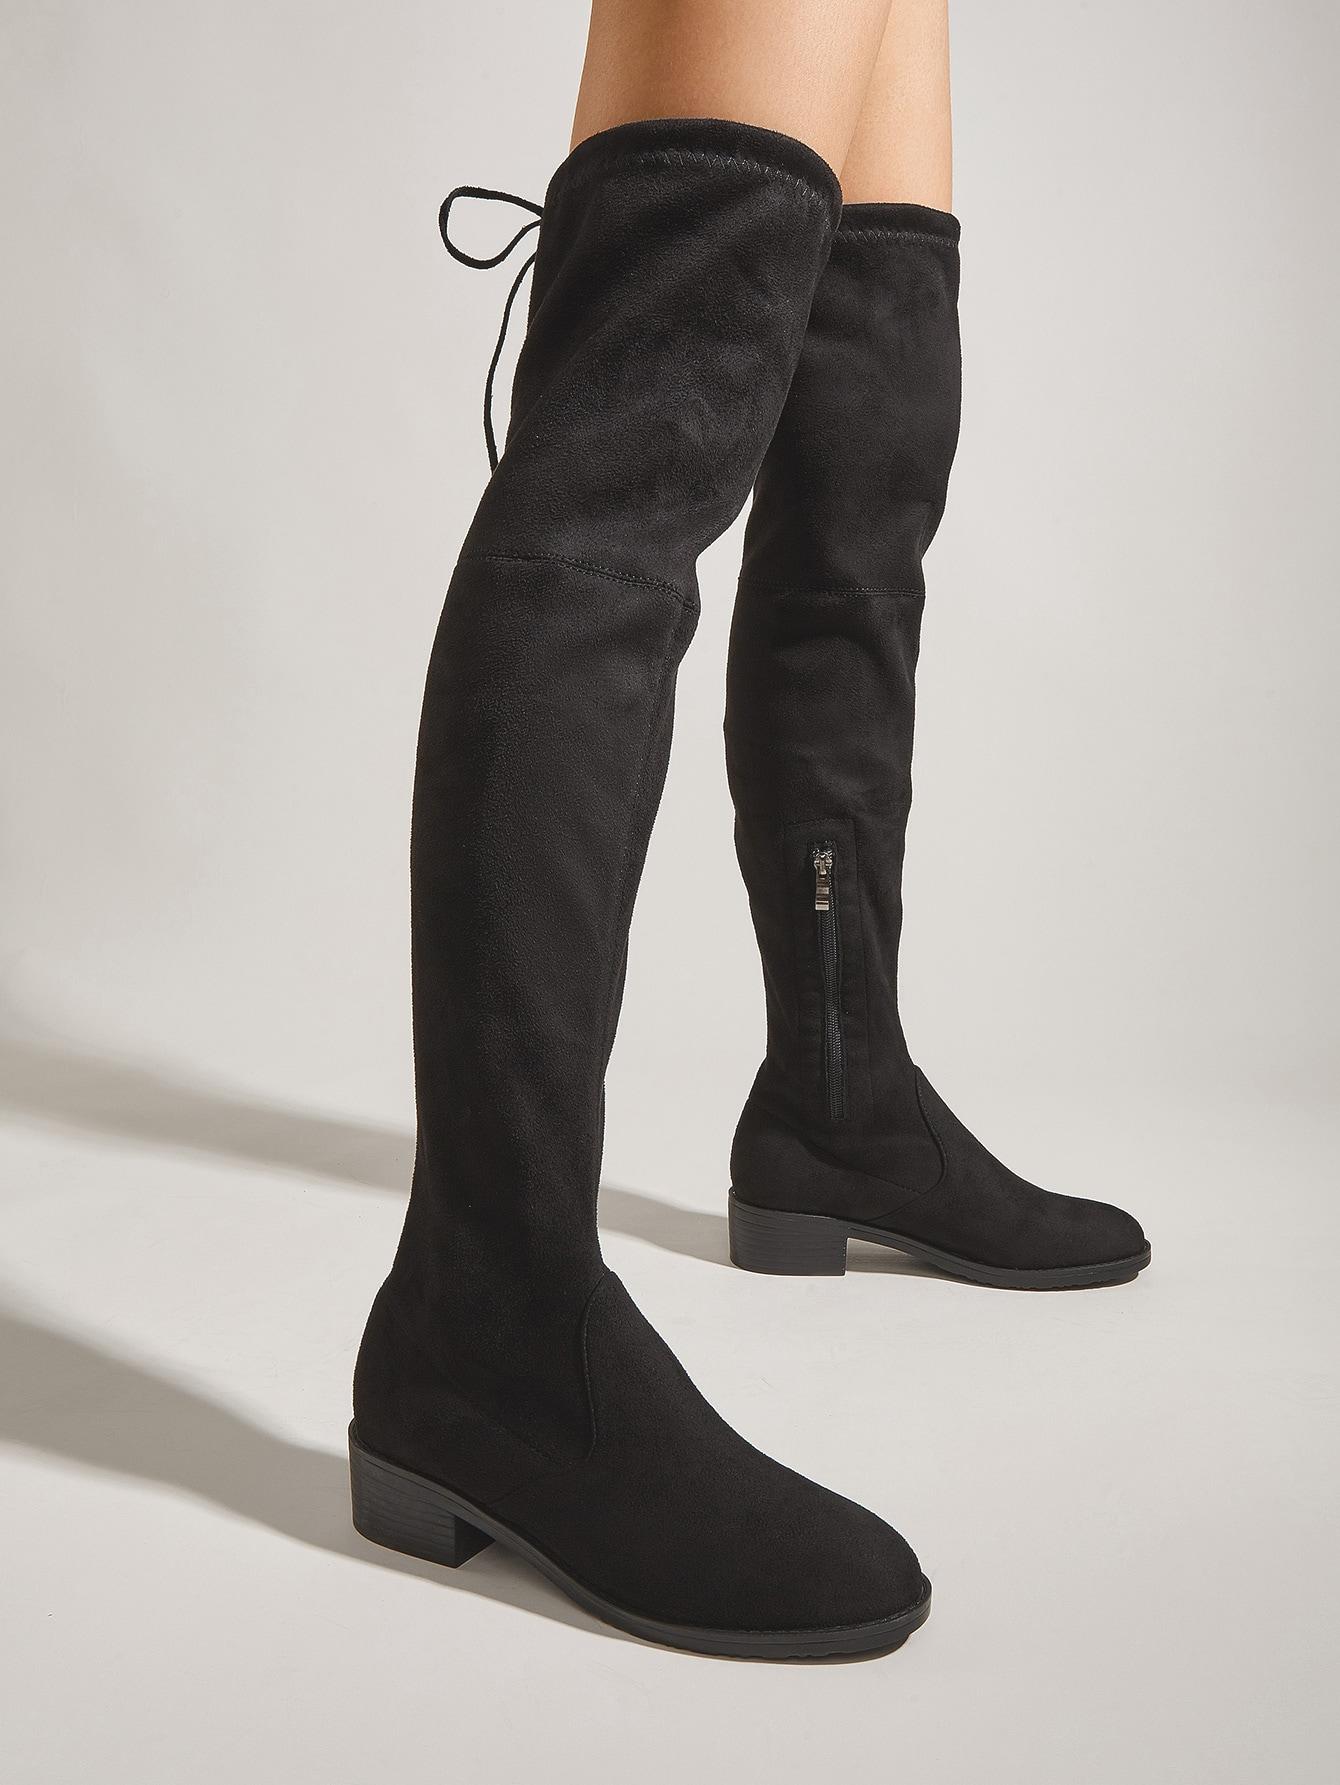 Minimalist Suede Side Zip Long Boots